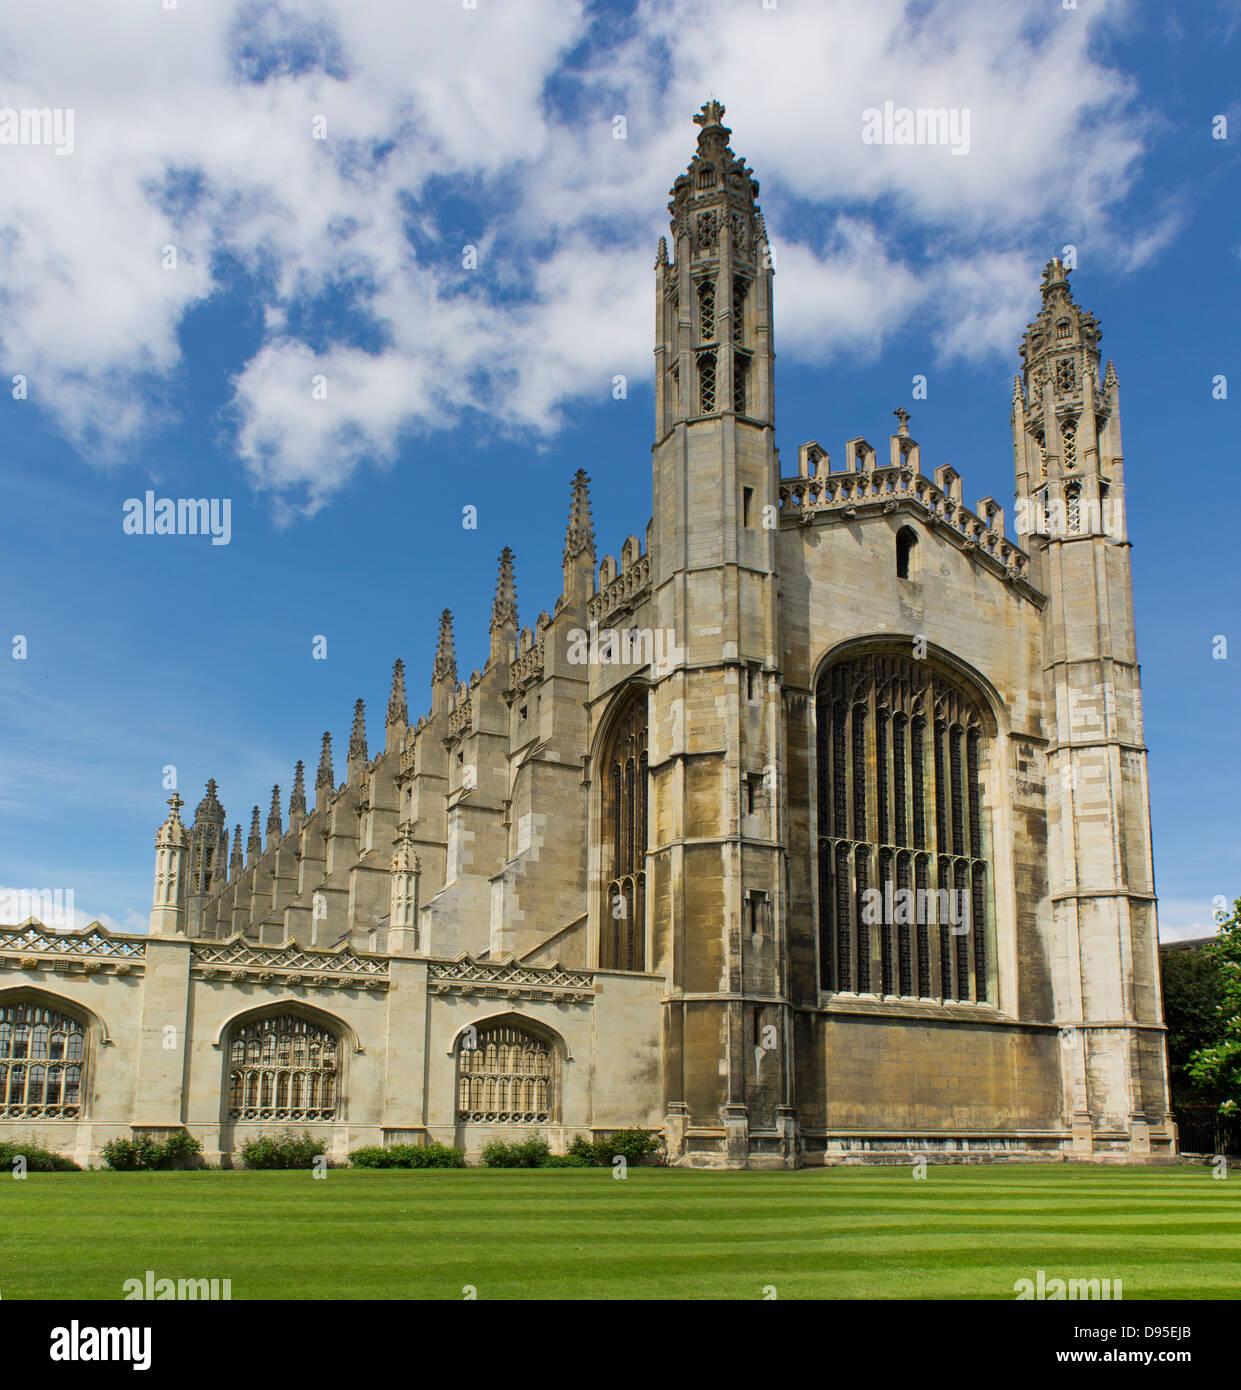 Cambridge England Uk - Stock Image